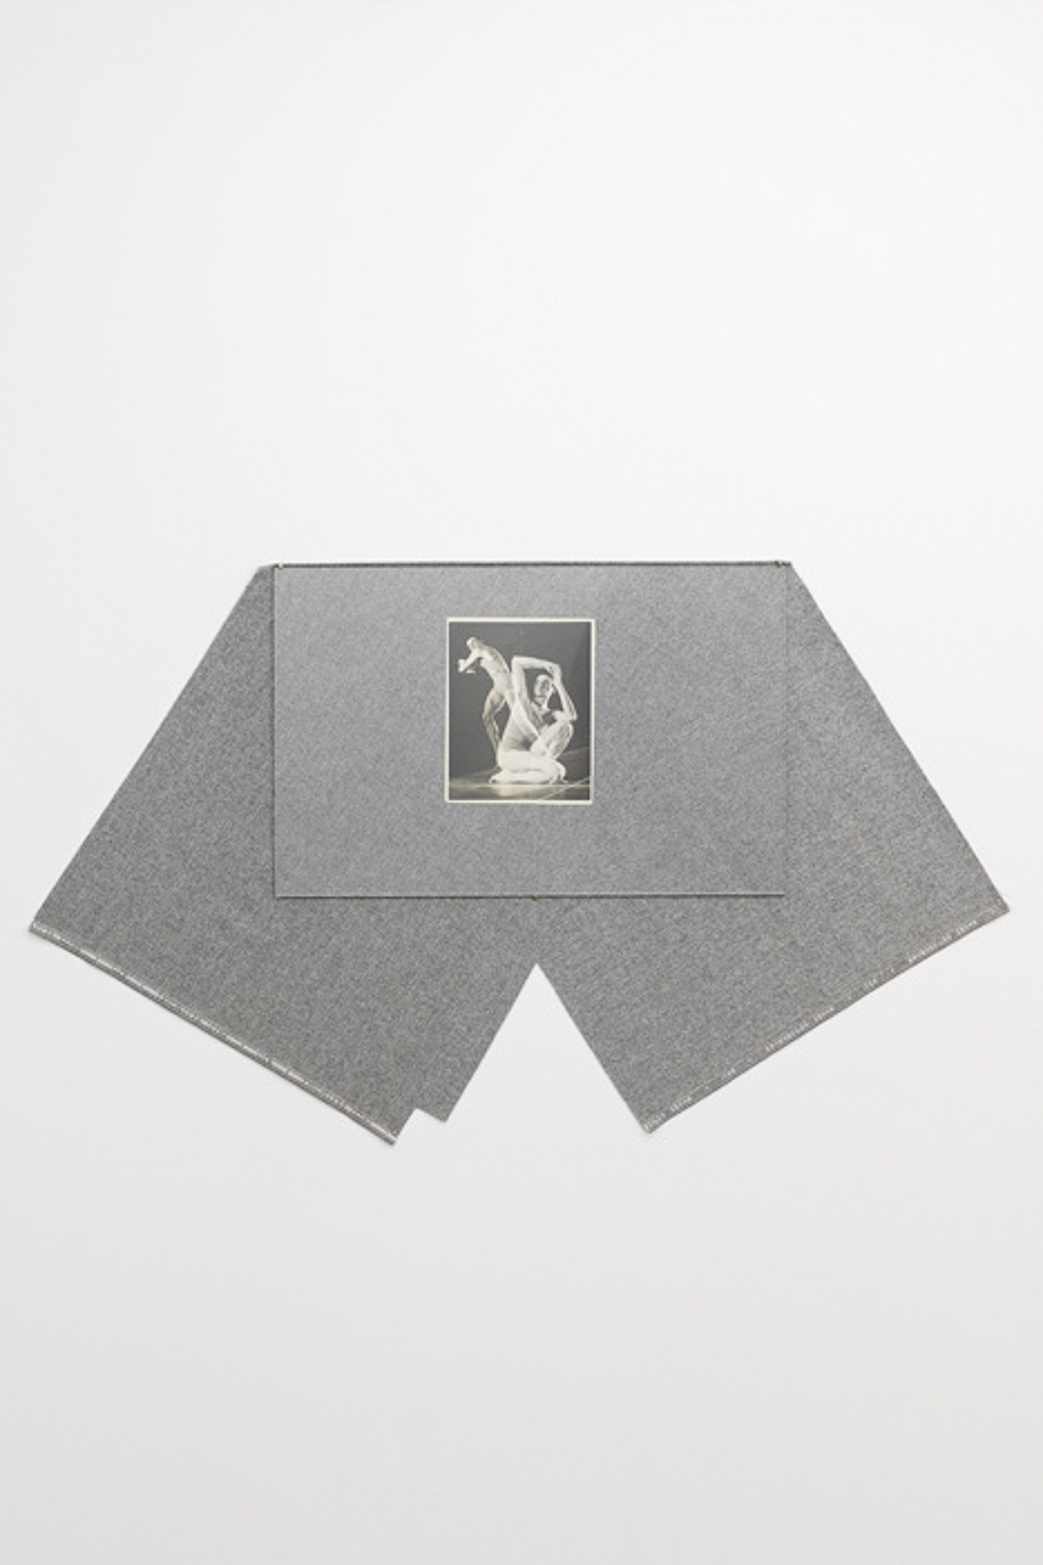 Jacopo Miliani, Folding Characters. Tenderpixel.